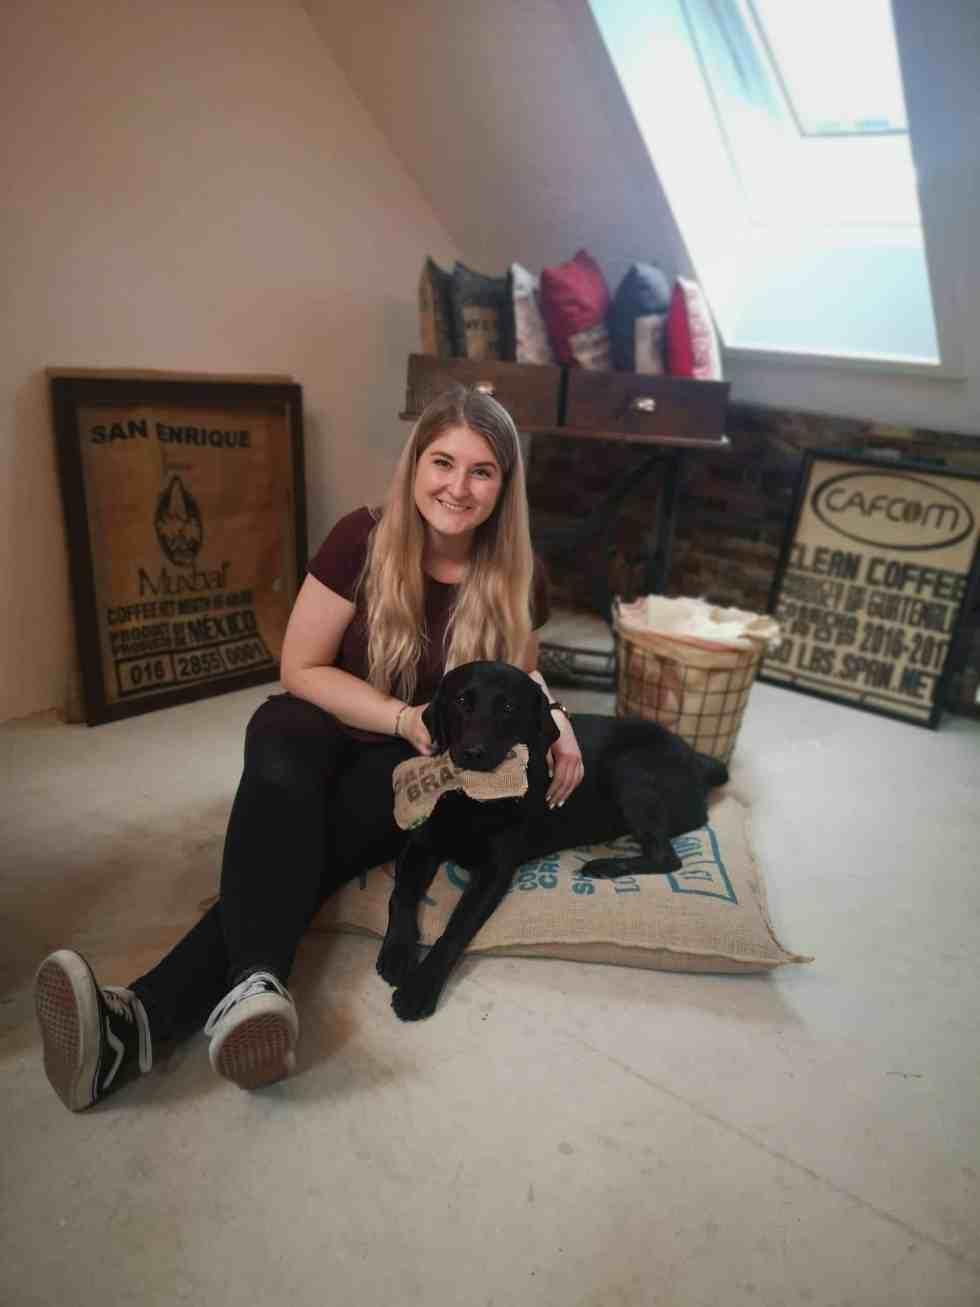 amigo-hundekissen-hundebett-nachhaltig-jute-schafwolle-fazit-erfahrung